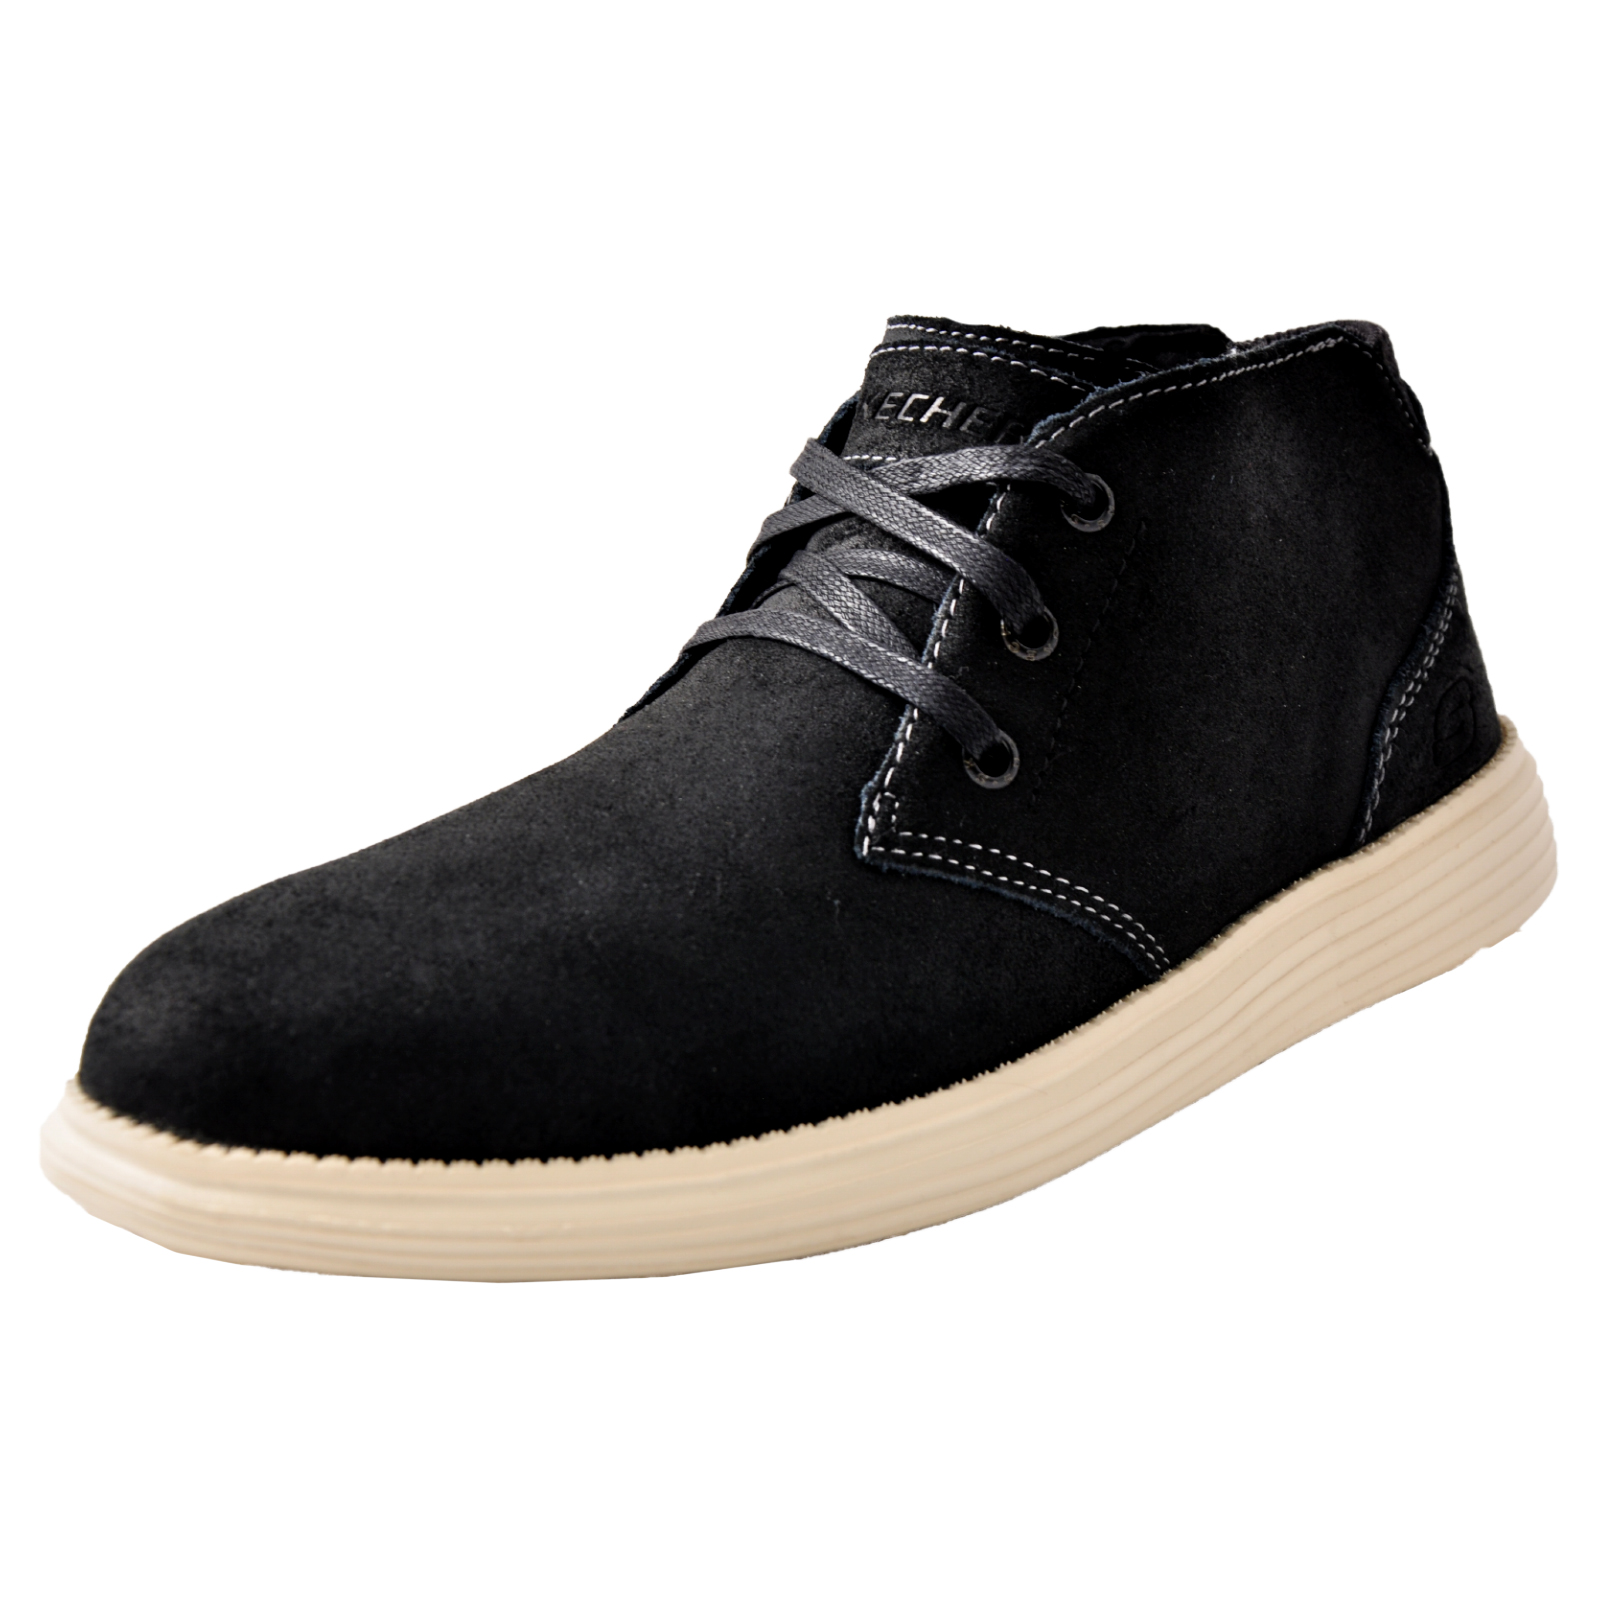 b6ea6780c8c9e Skechers Status-Rolano Men s Memory Foam Smart Leather Chukka Ankle Boots  Black